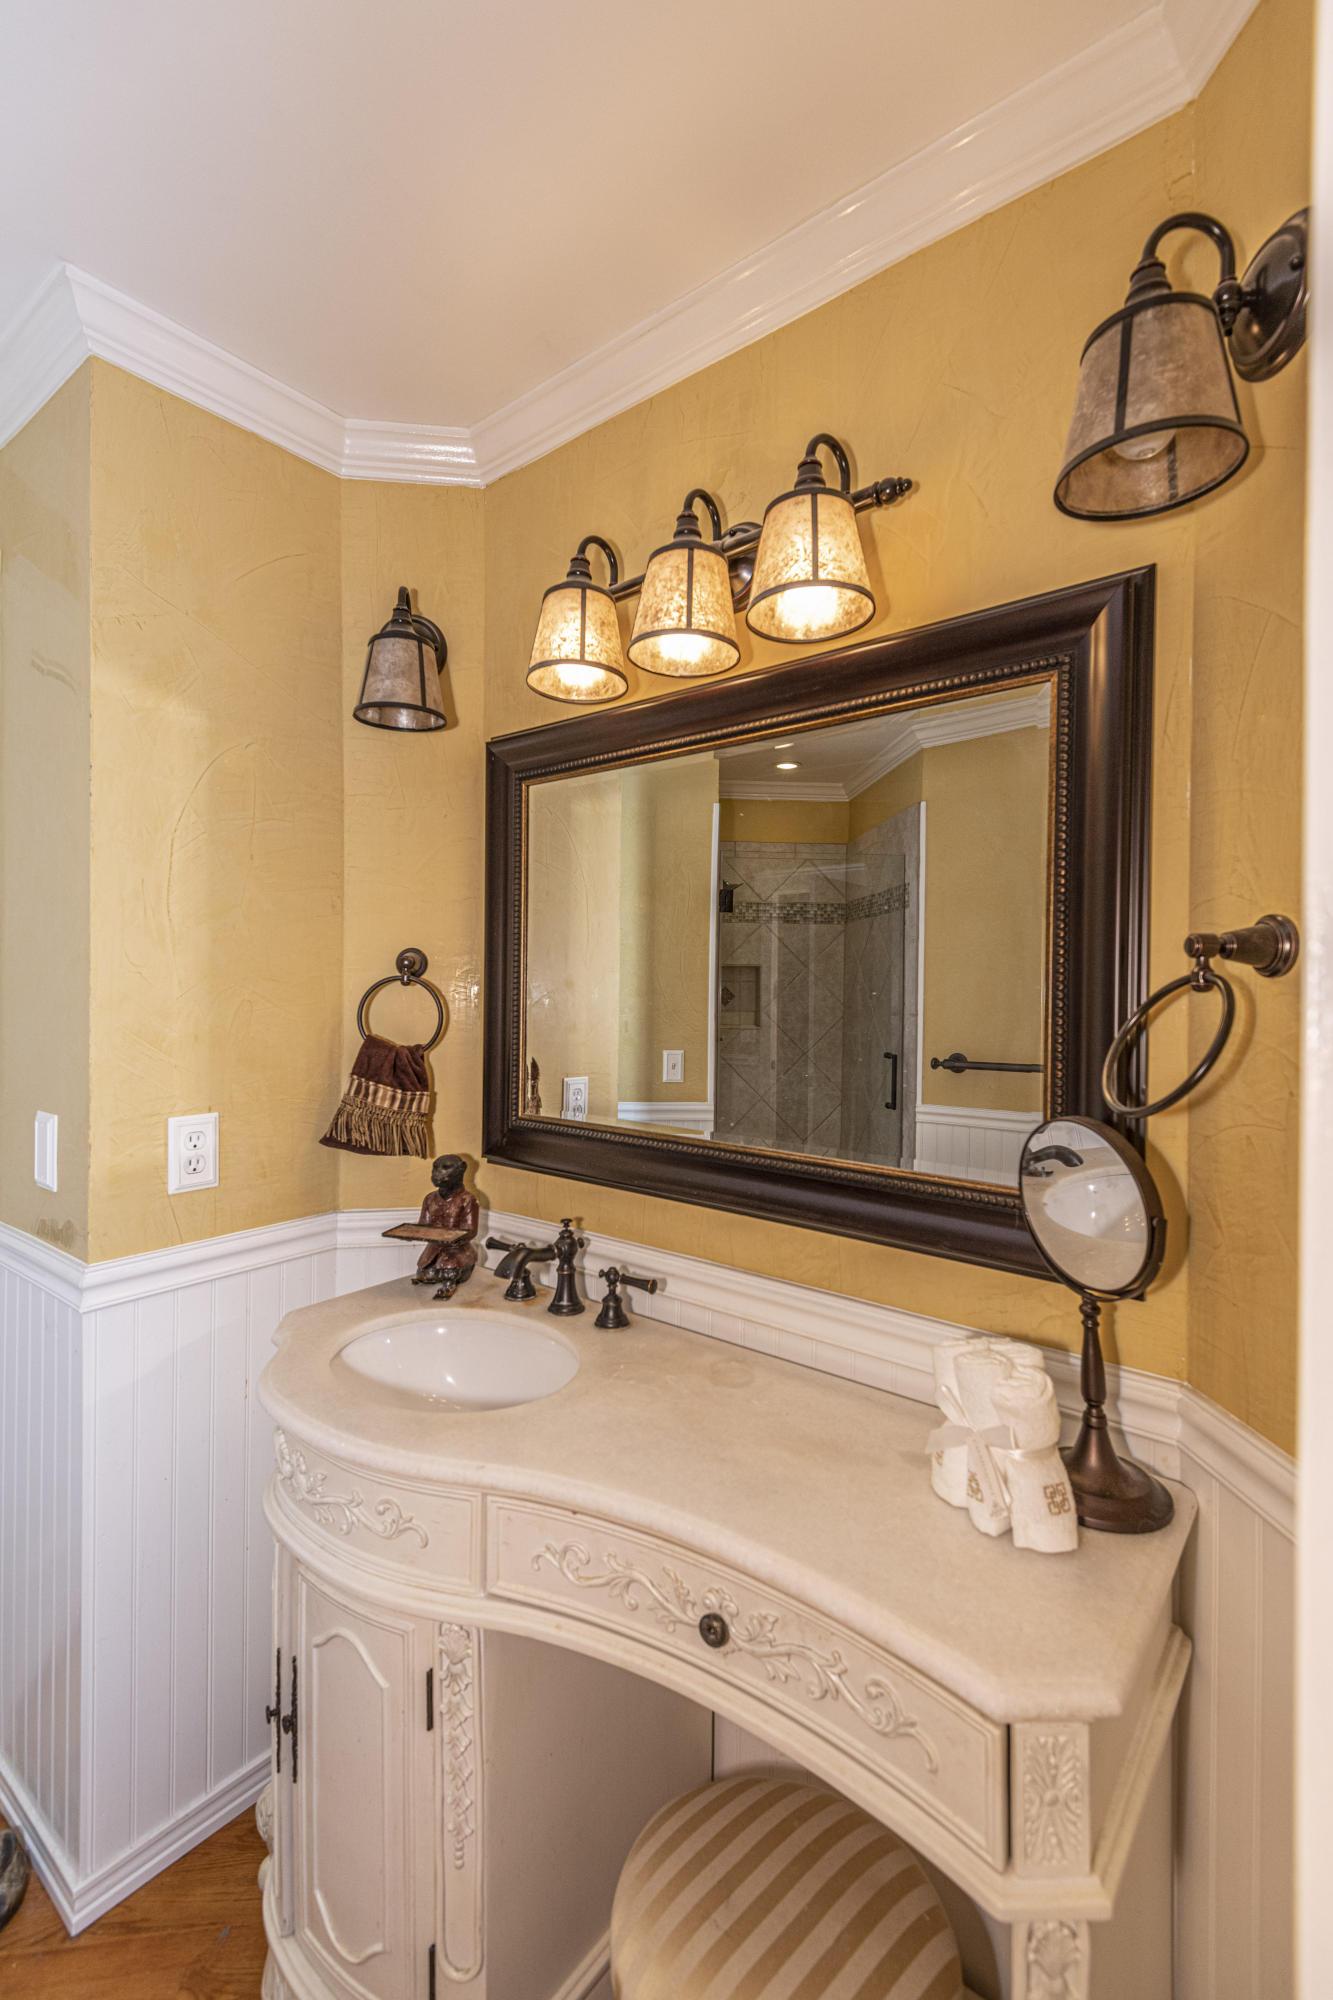 White Point Homes For Sale - 886 White Point, Charleston, SC - 2